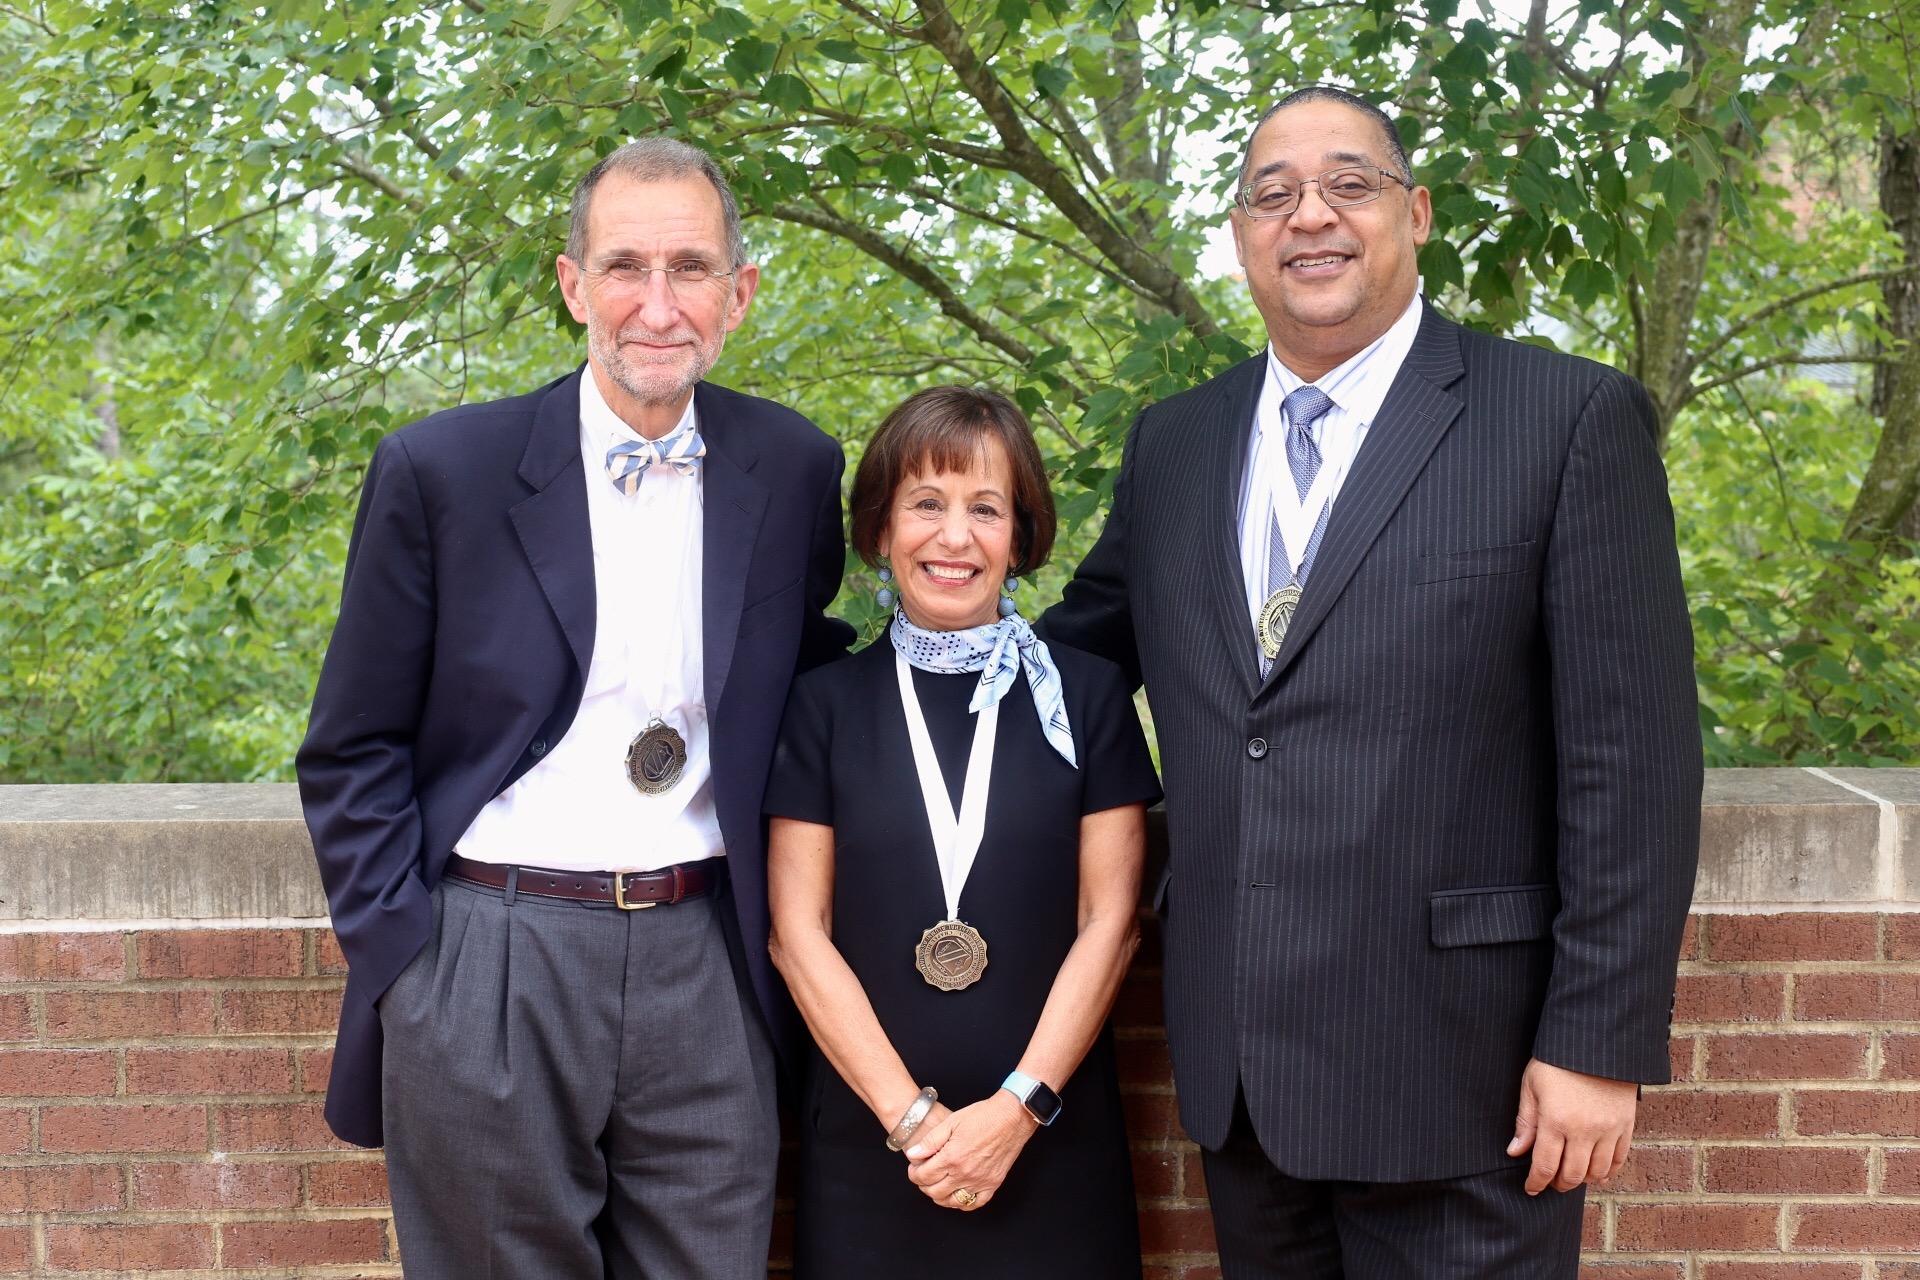 Bill Roper, Carol L. Folt and Winston Crisp